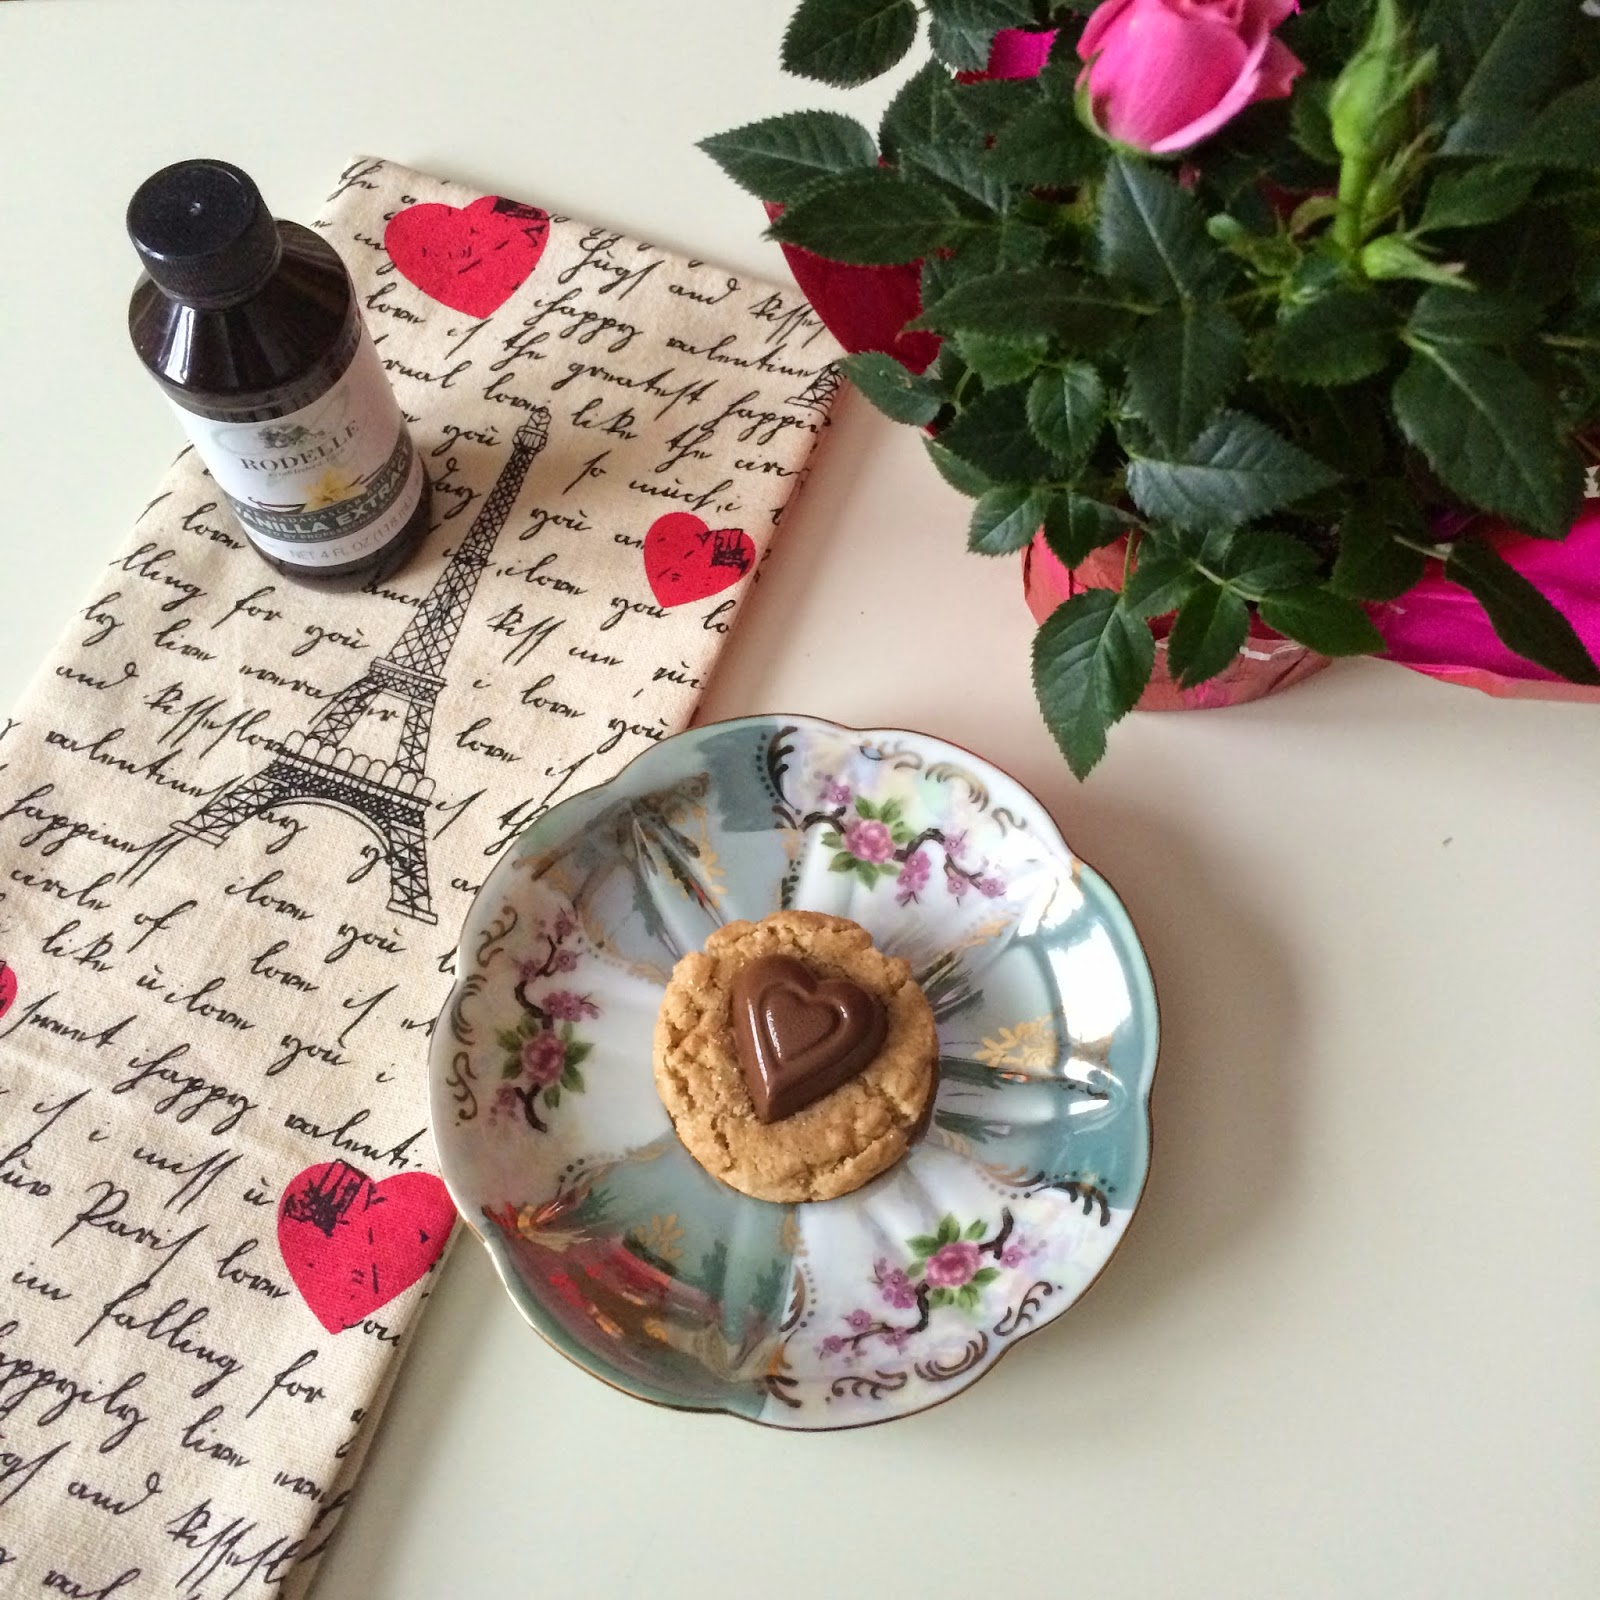 Peanut Butter Snickerdoodles, Cookie, Recipe, Valentine's Day